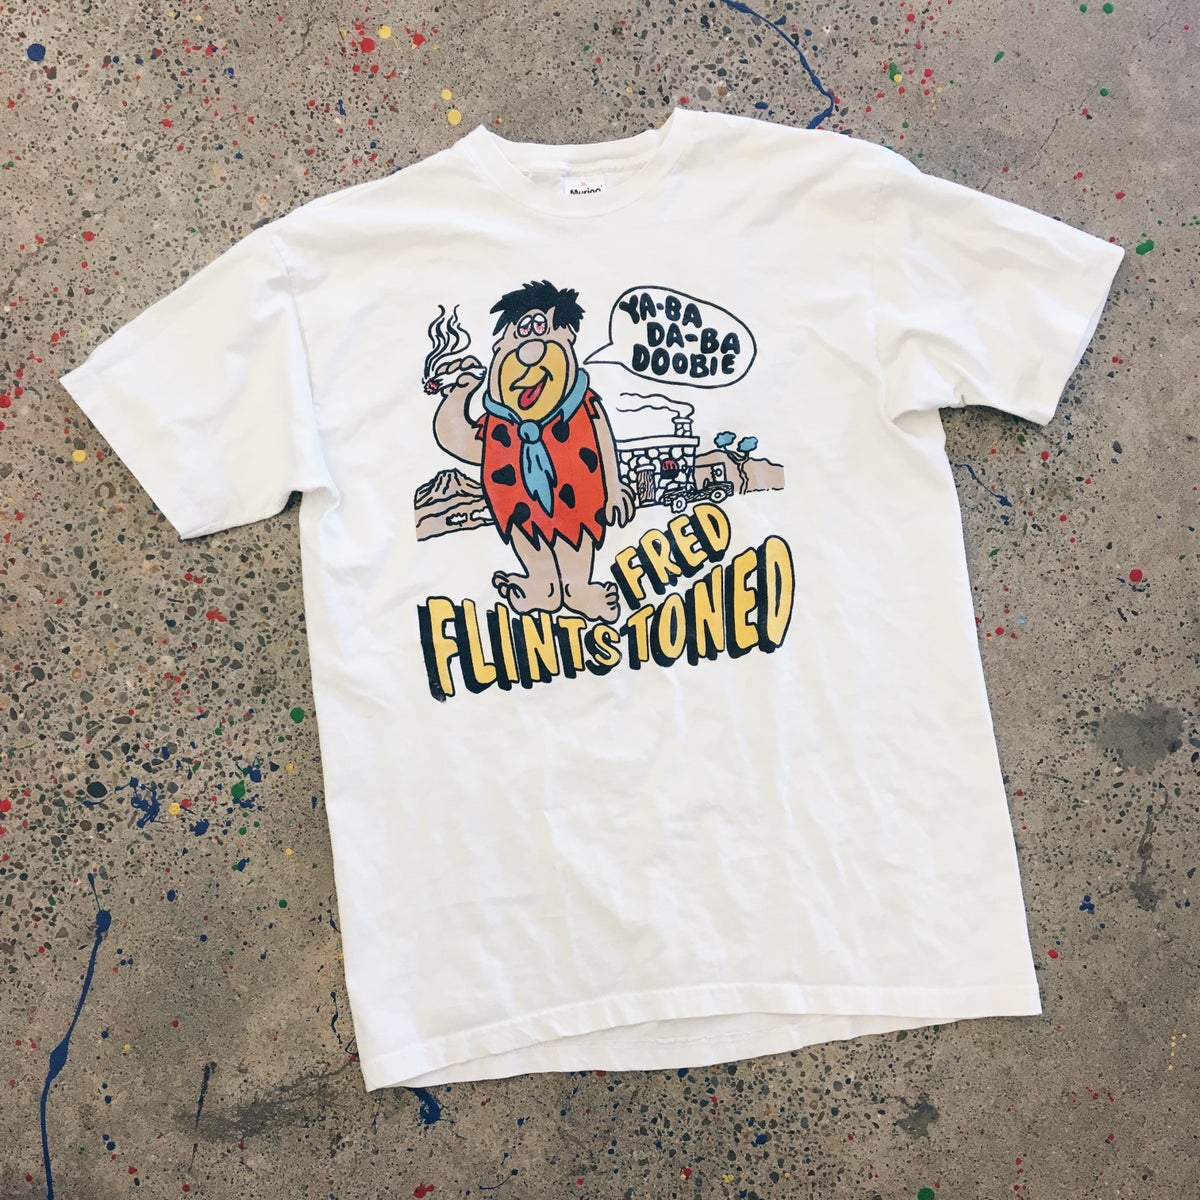 Image of Original 1995 Fred Flintstoned Grateful Dead Tee.